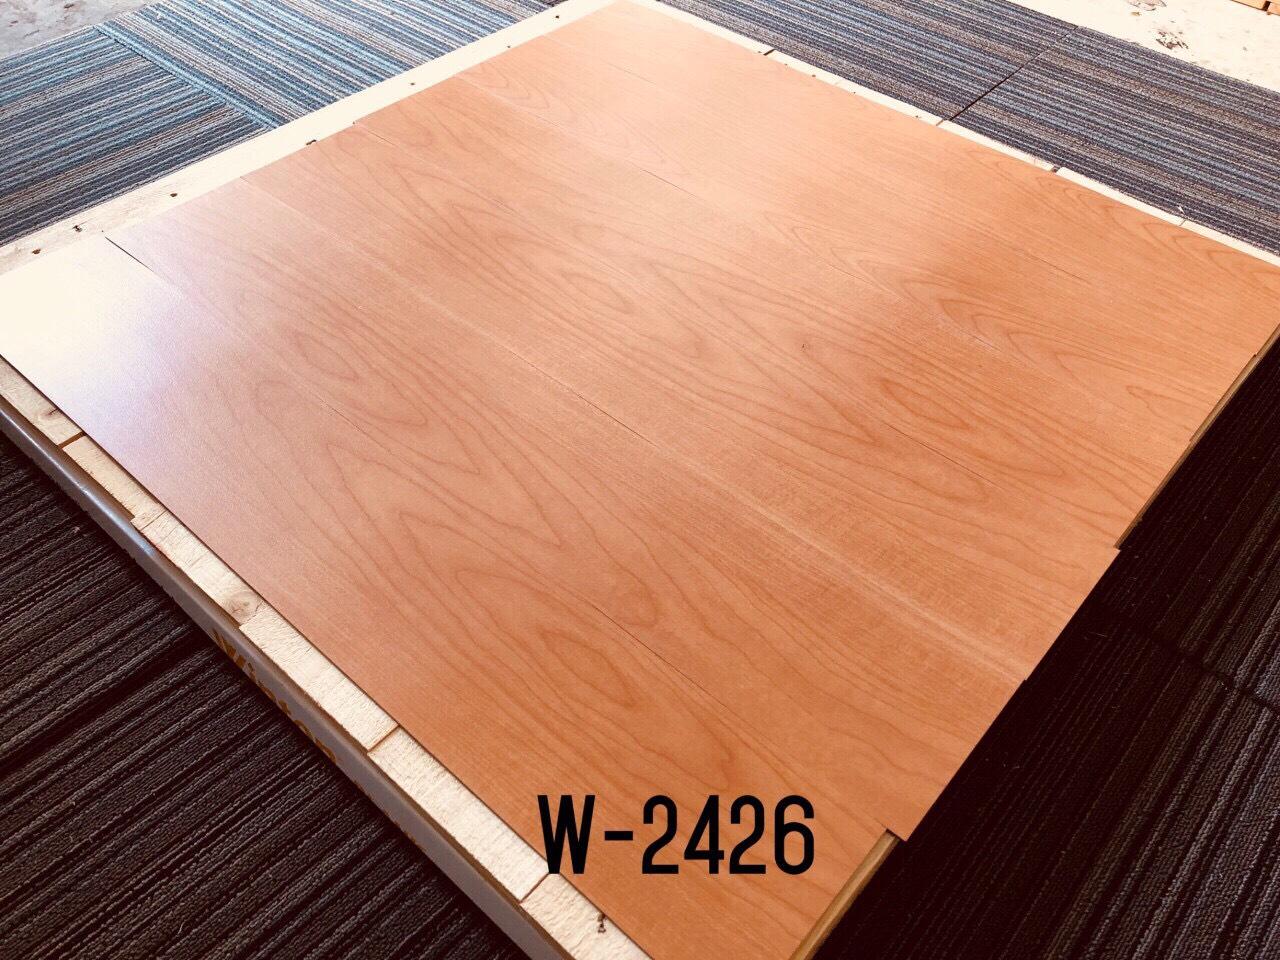 Sàn nhựa vân gỗ Nanolife 3mm W2426